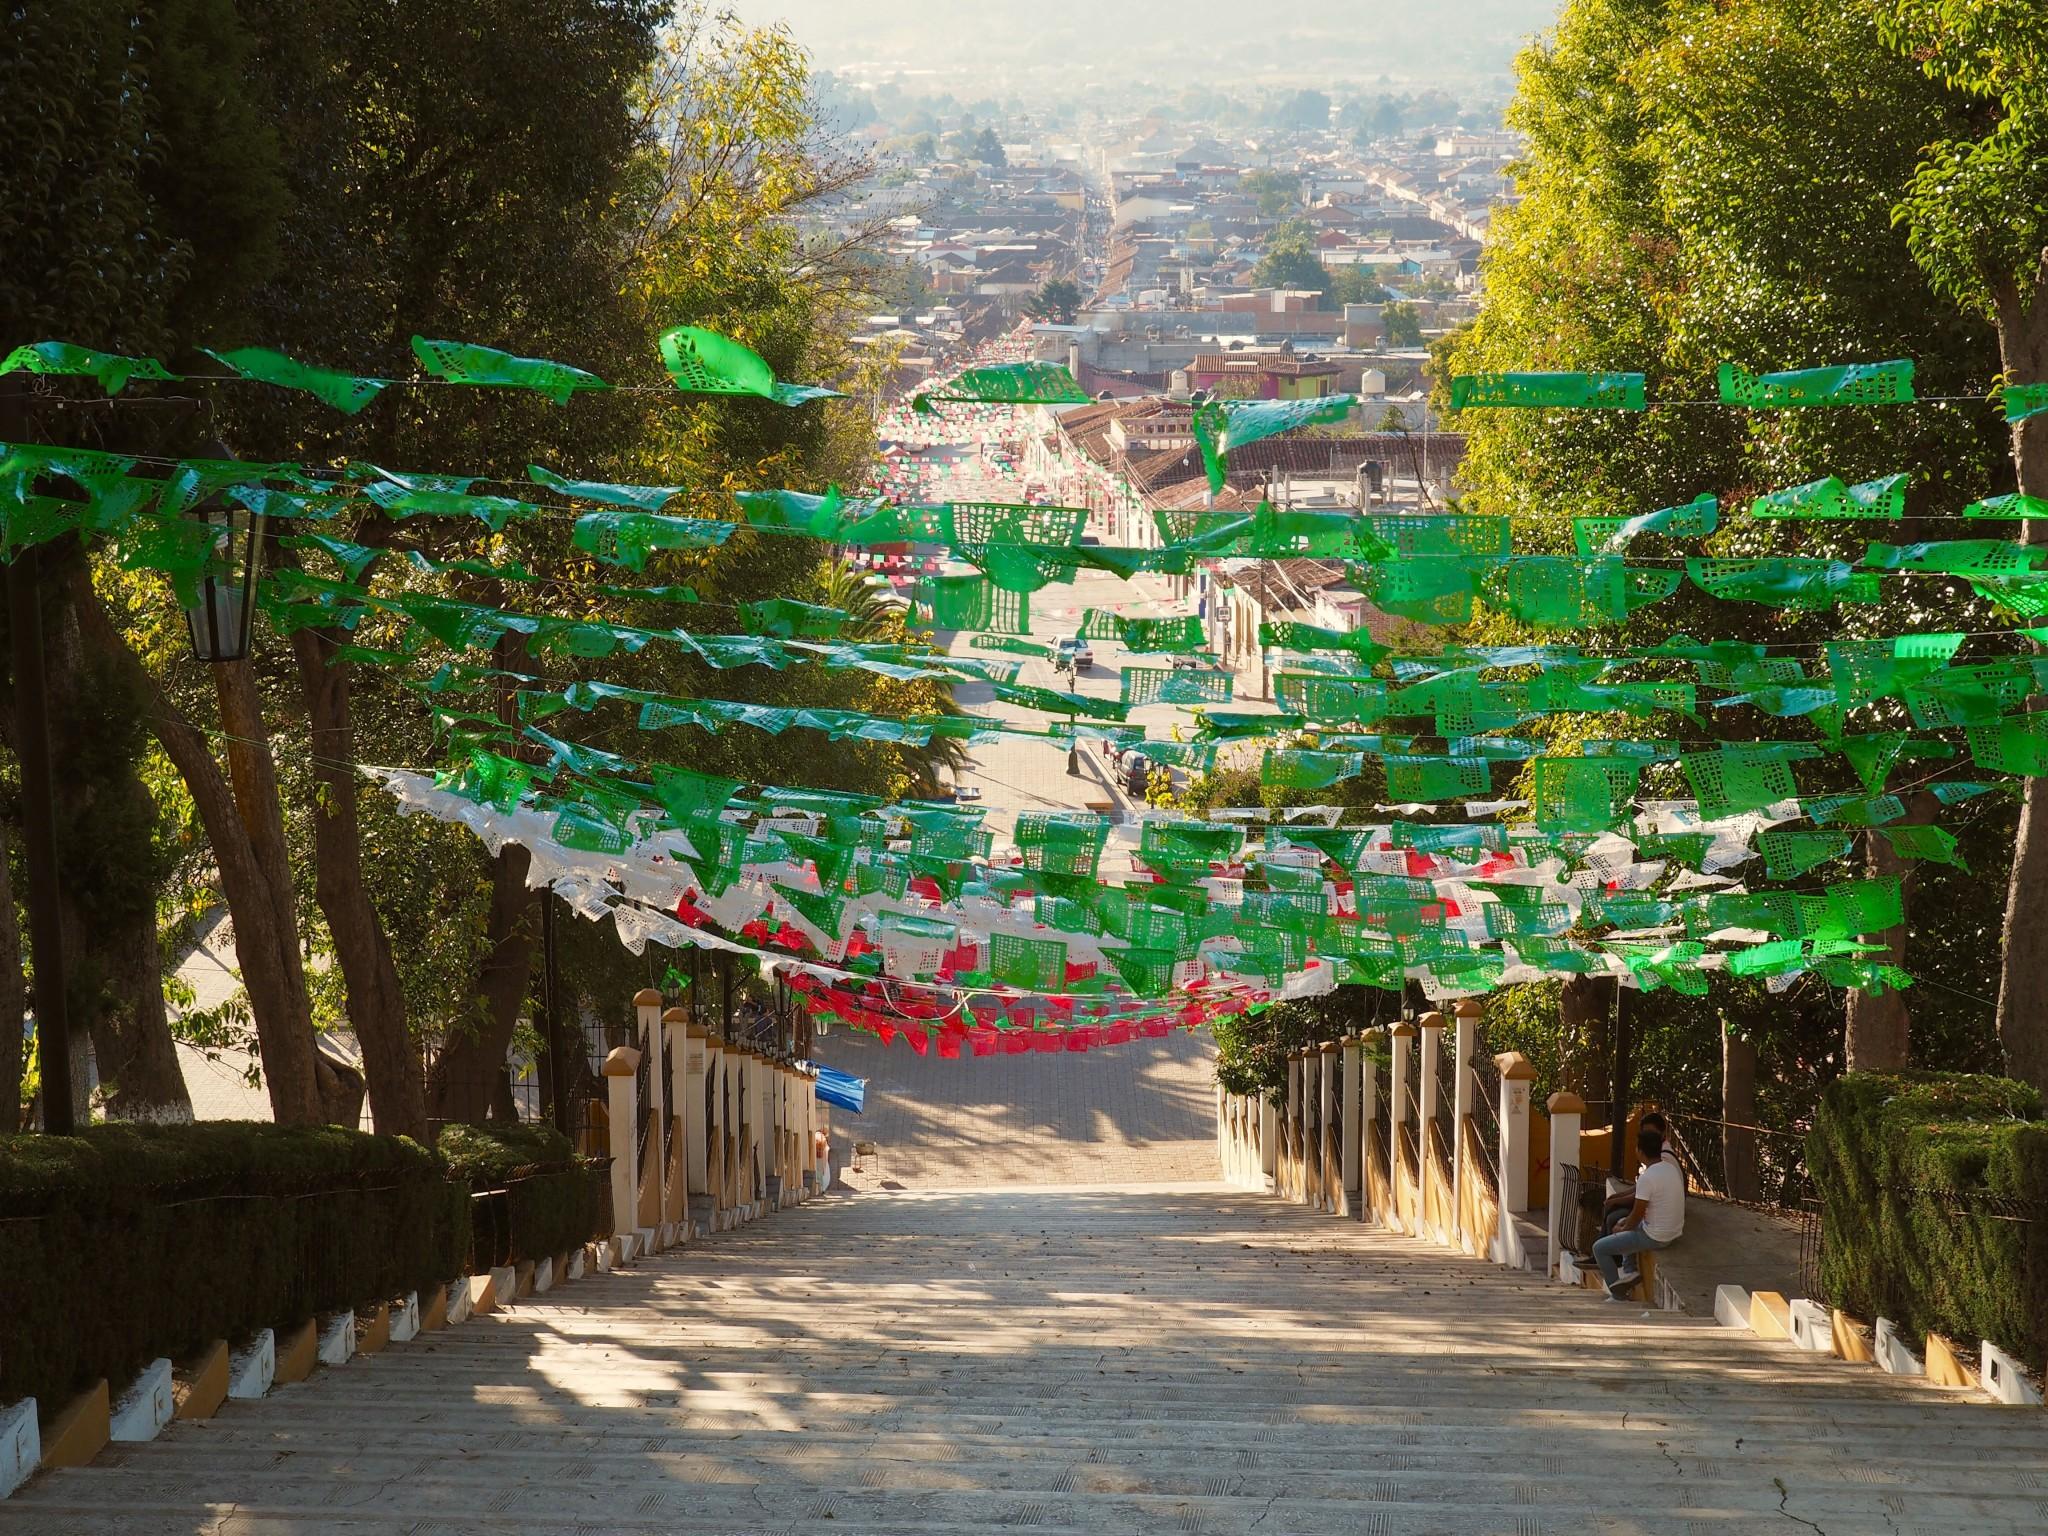 Blick auf San Cristobal de las Casas